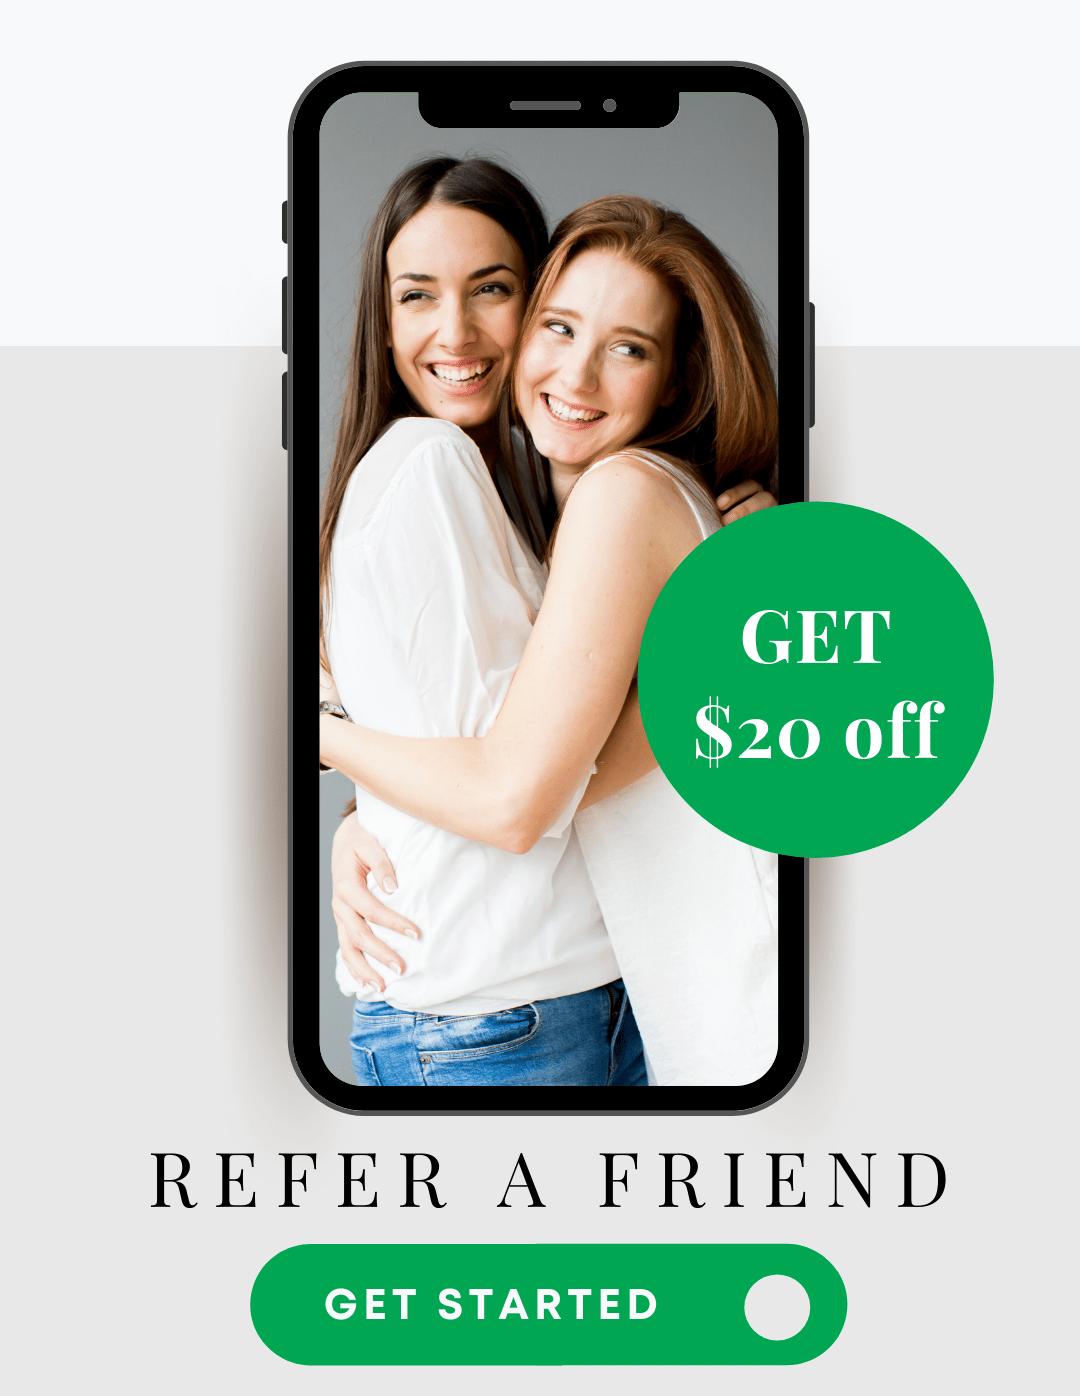 Refer a Friend Get kangaroo Credits